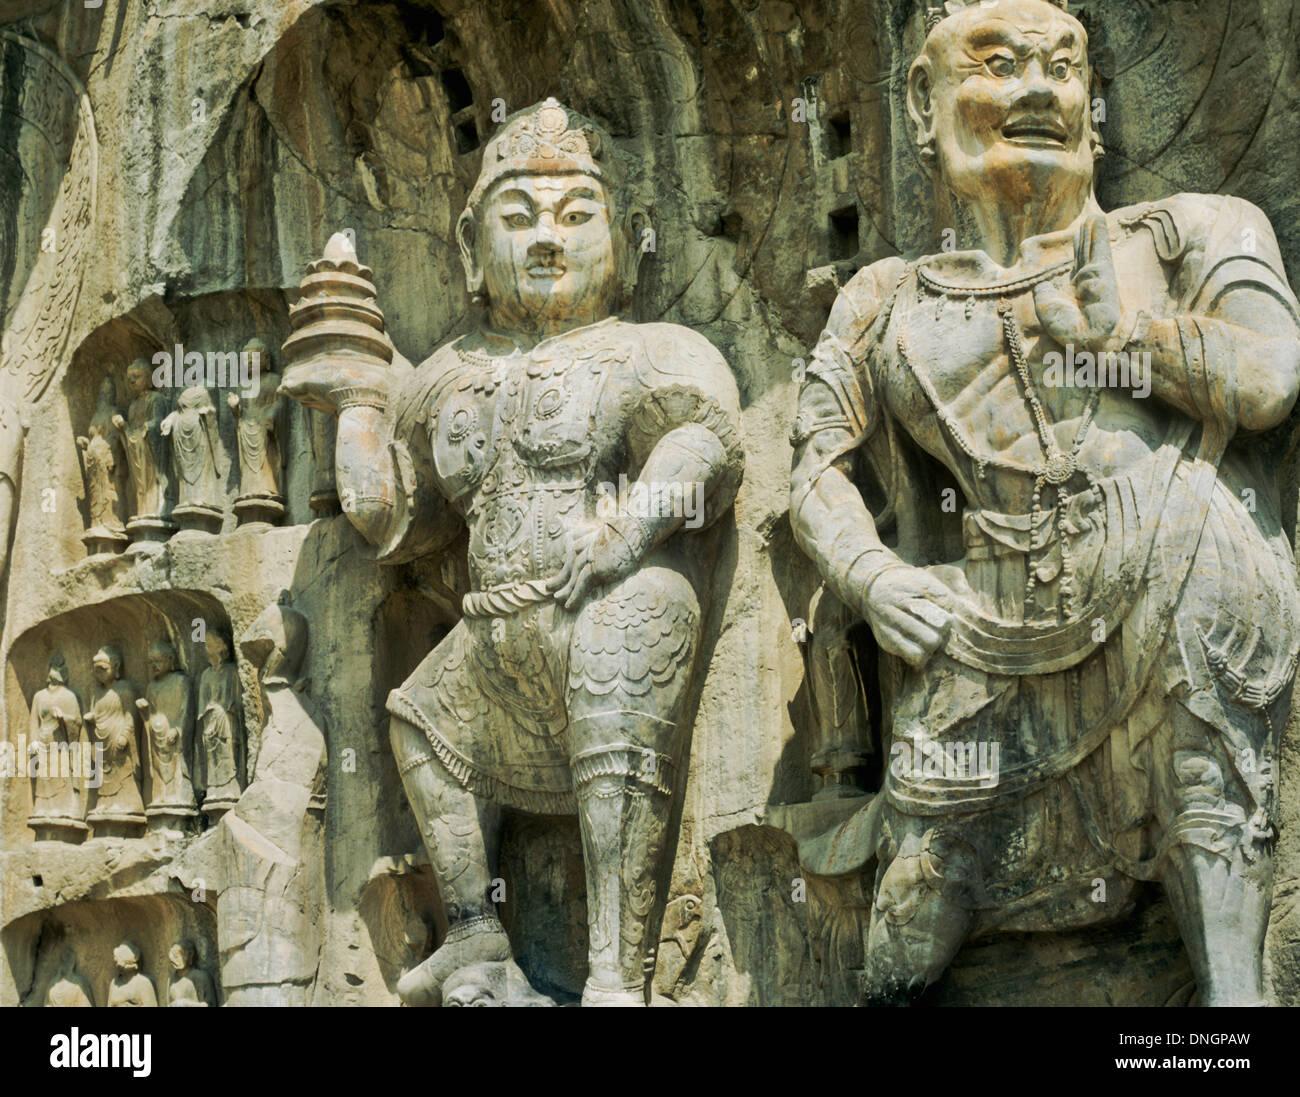 Detail of the Longmen Grottoes, Luoyang, Henan, China - Stock Image